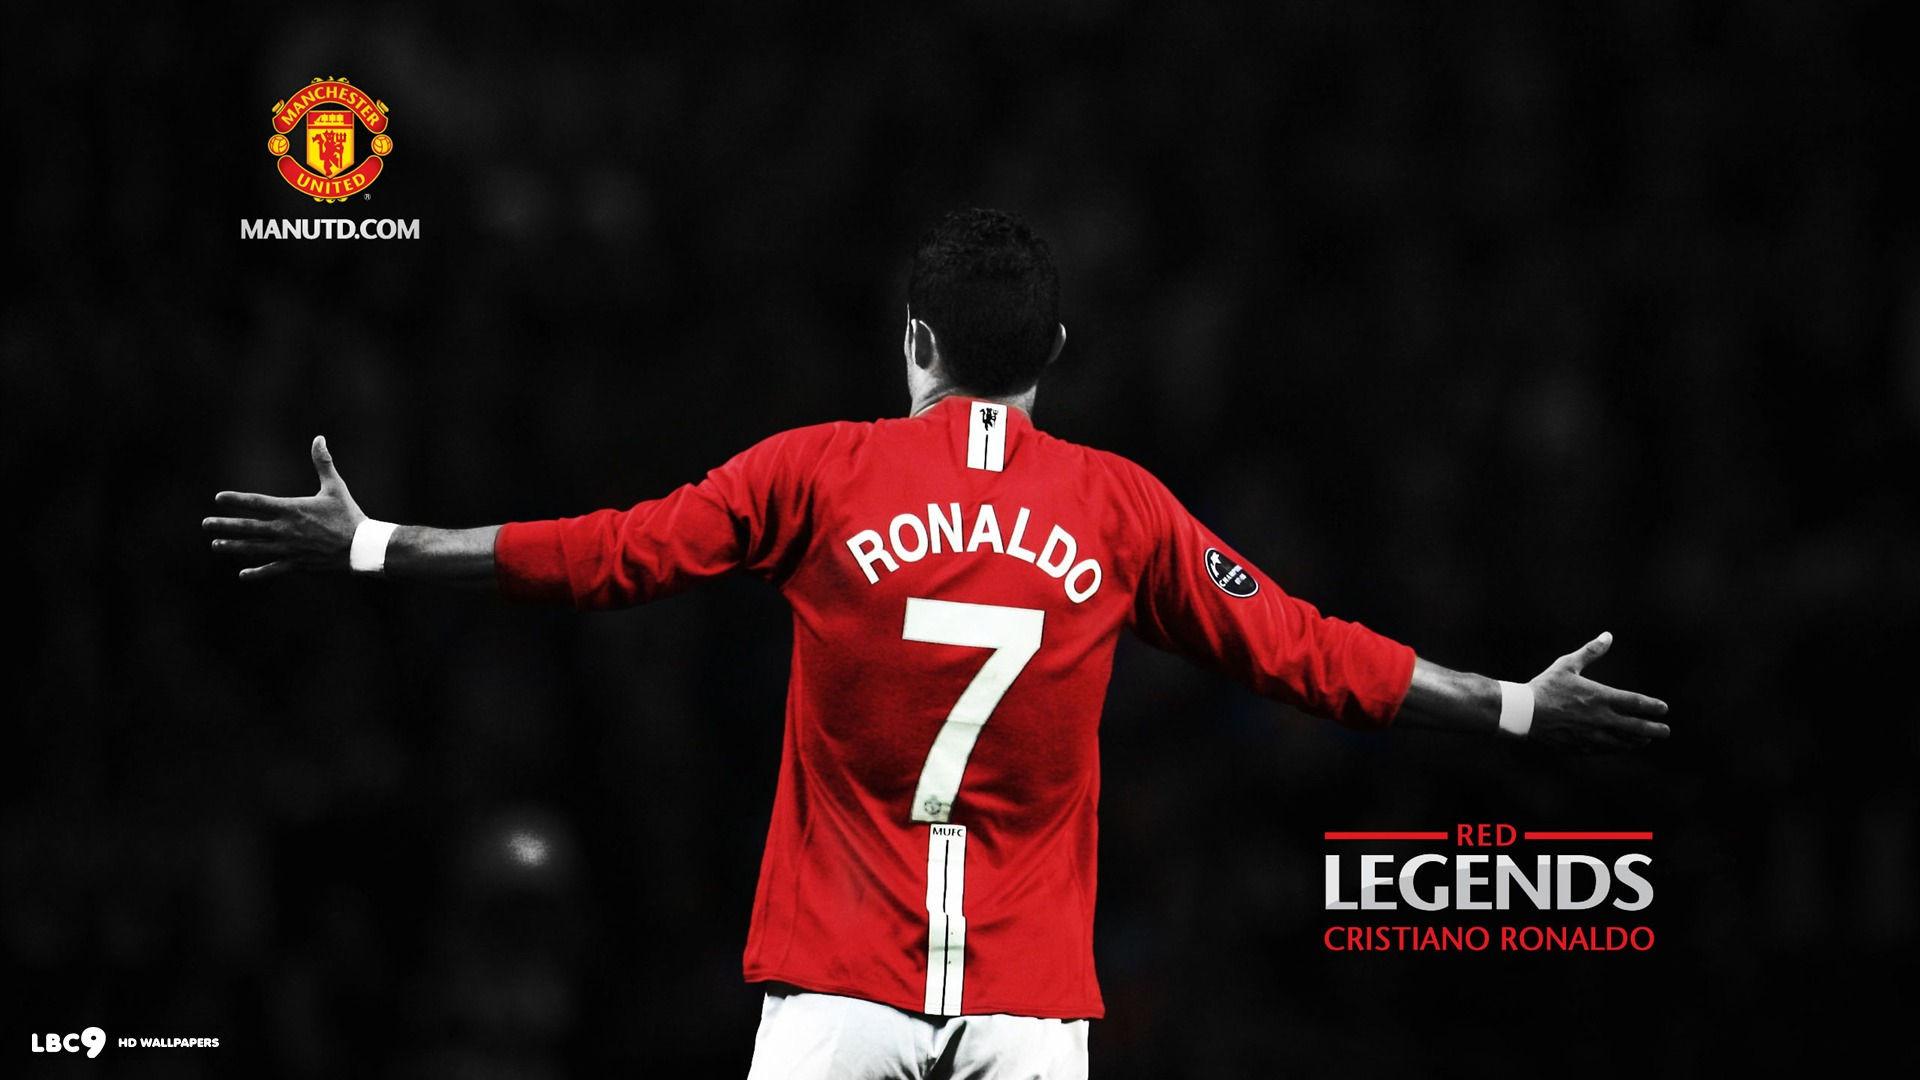 cristiano ronaldo red legends manchester united